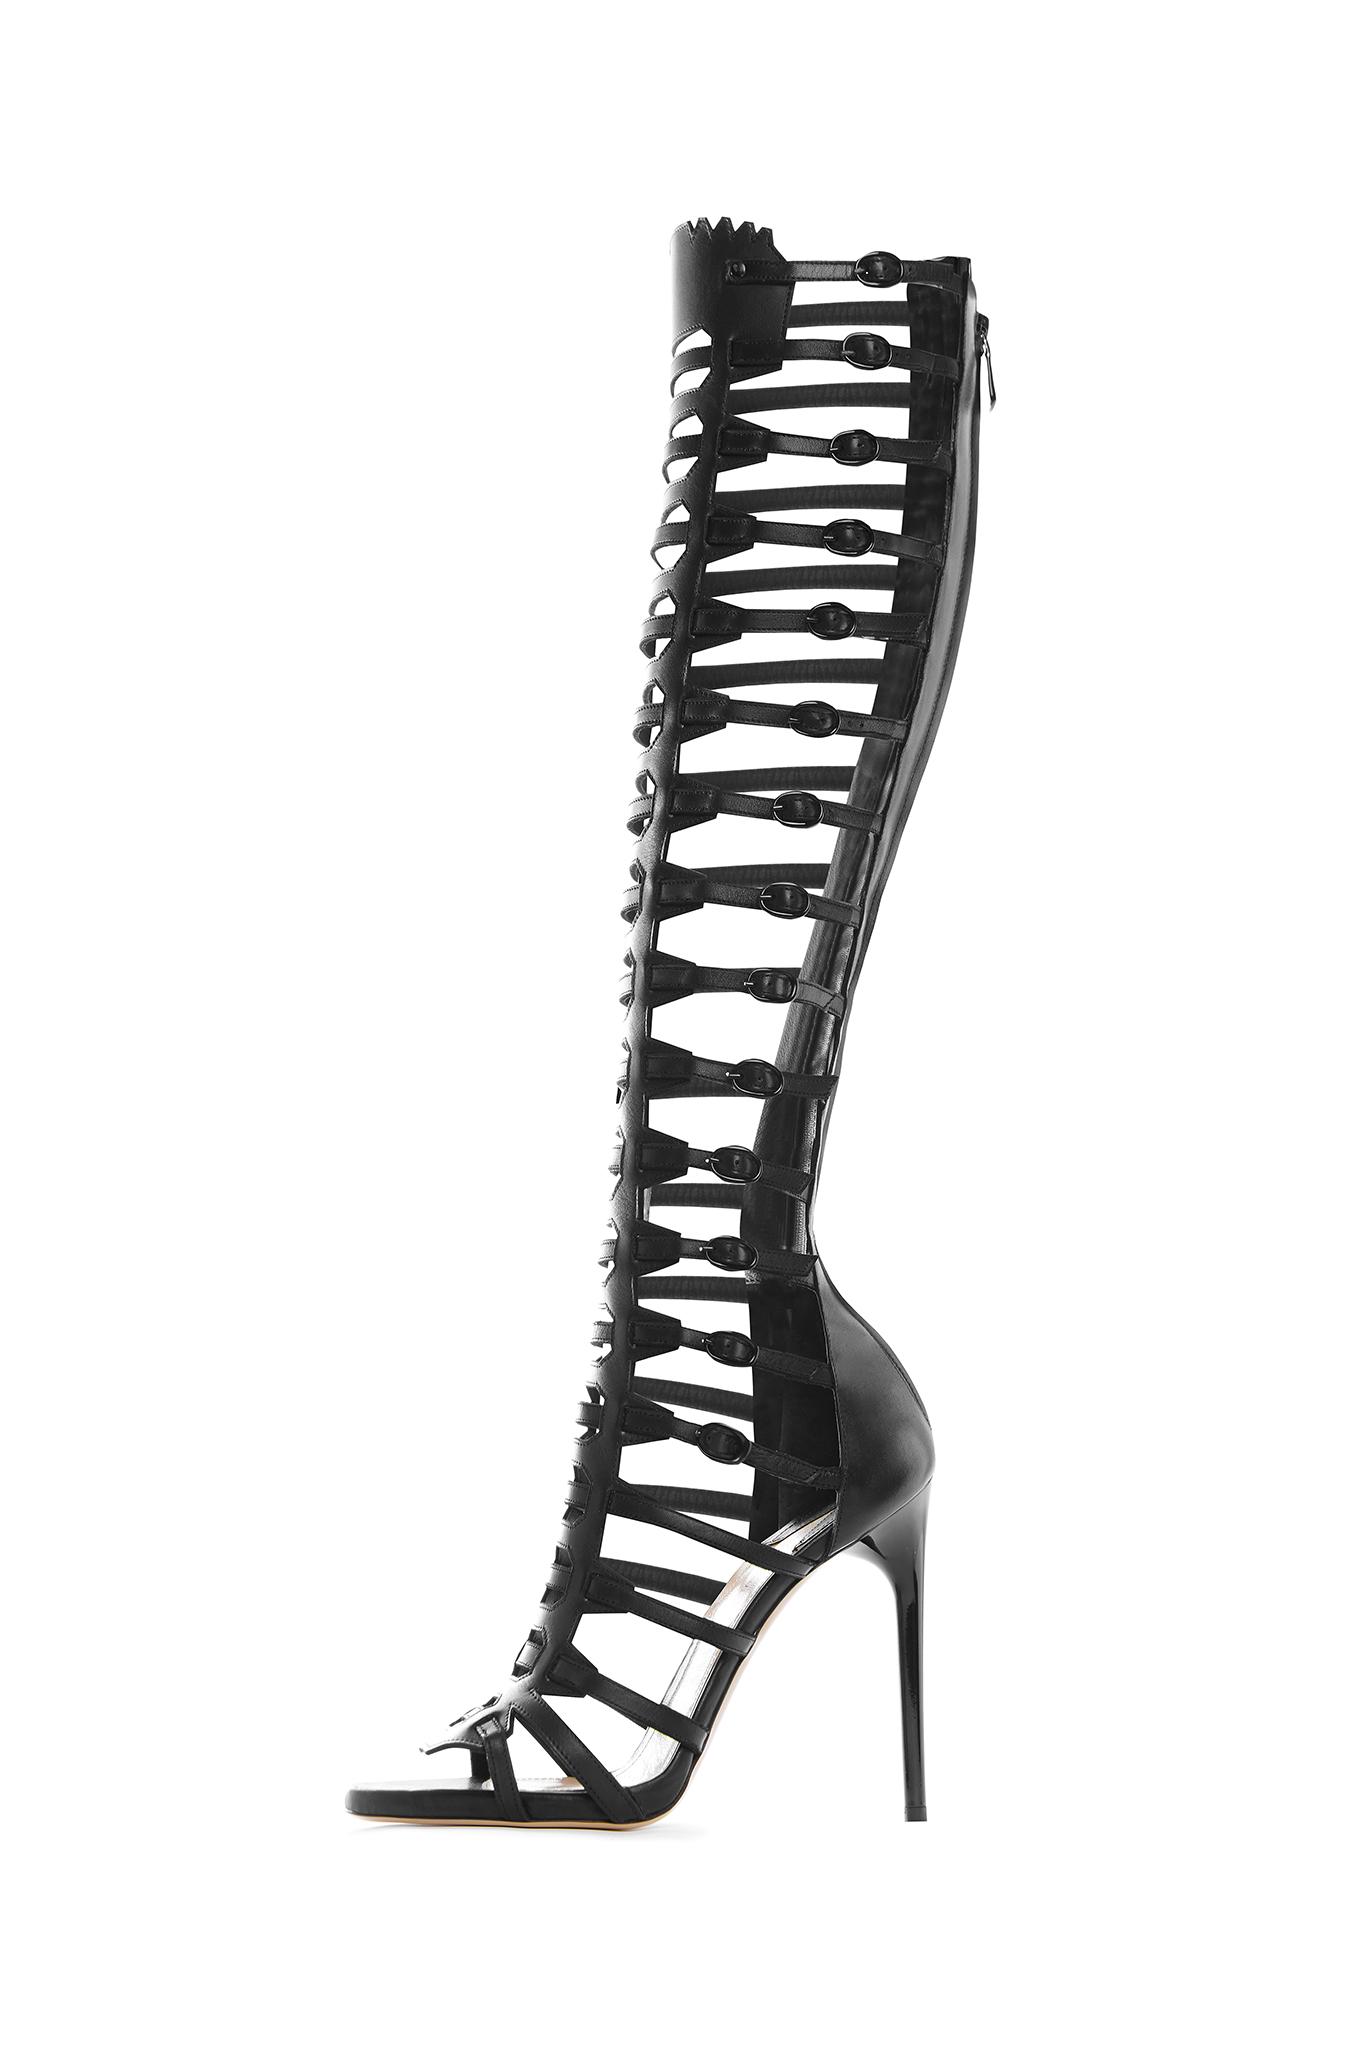 03-05-heeled-gladiator.jpg